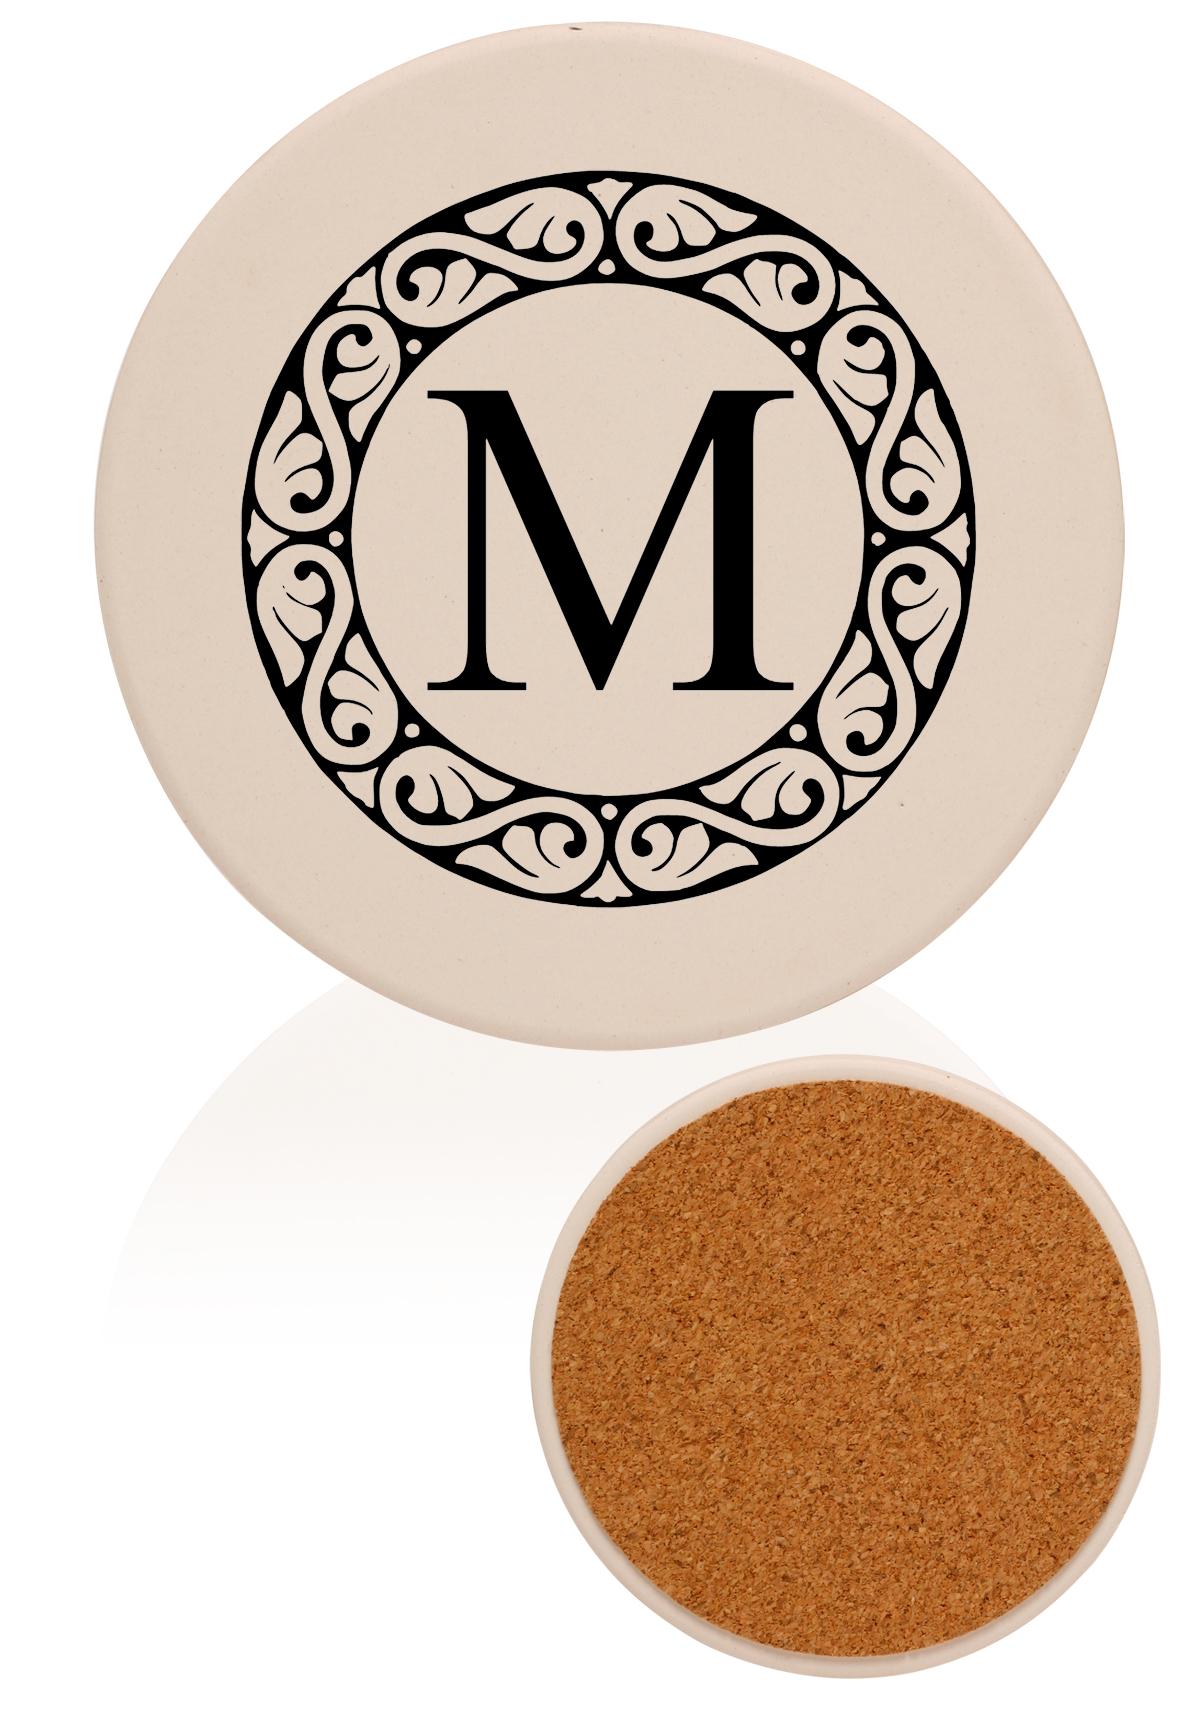 Personalized Ceramic Coasters I Custom Printed Round Coasters I ...